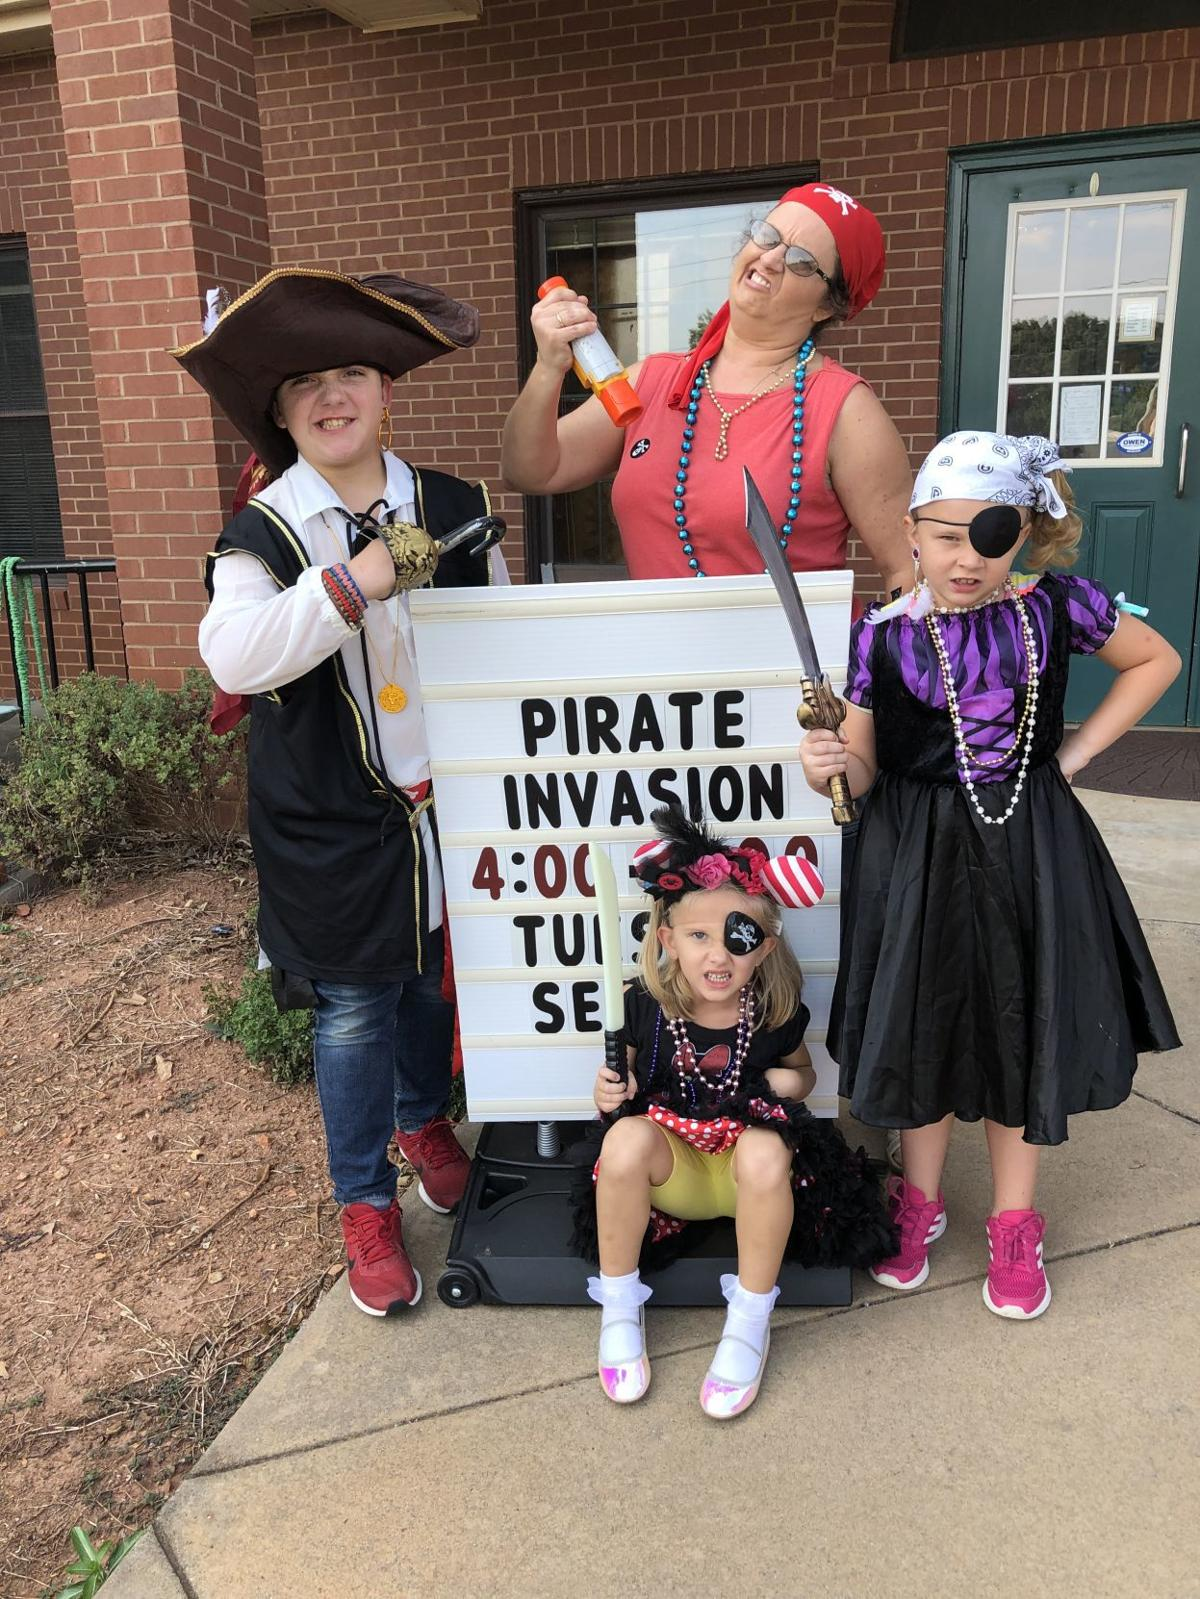 Pirates invade Nicholson library